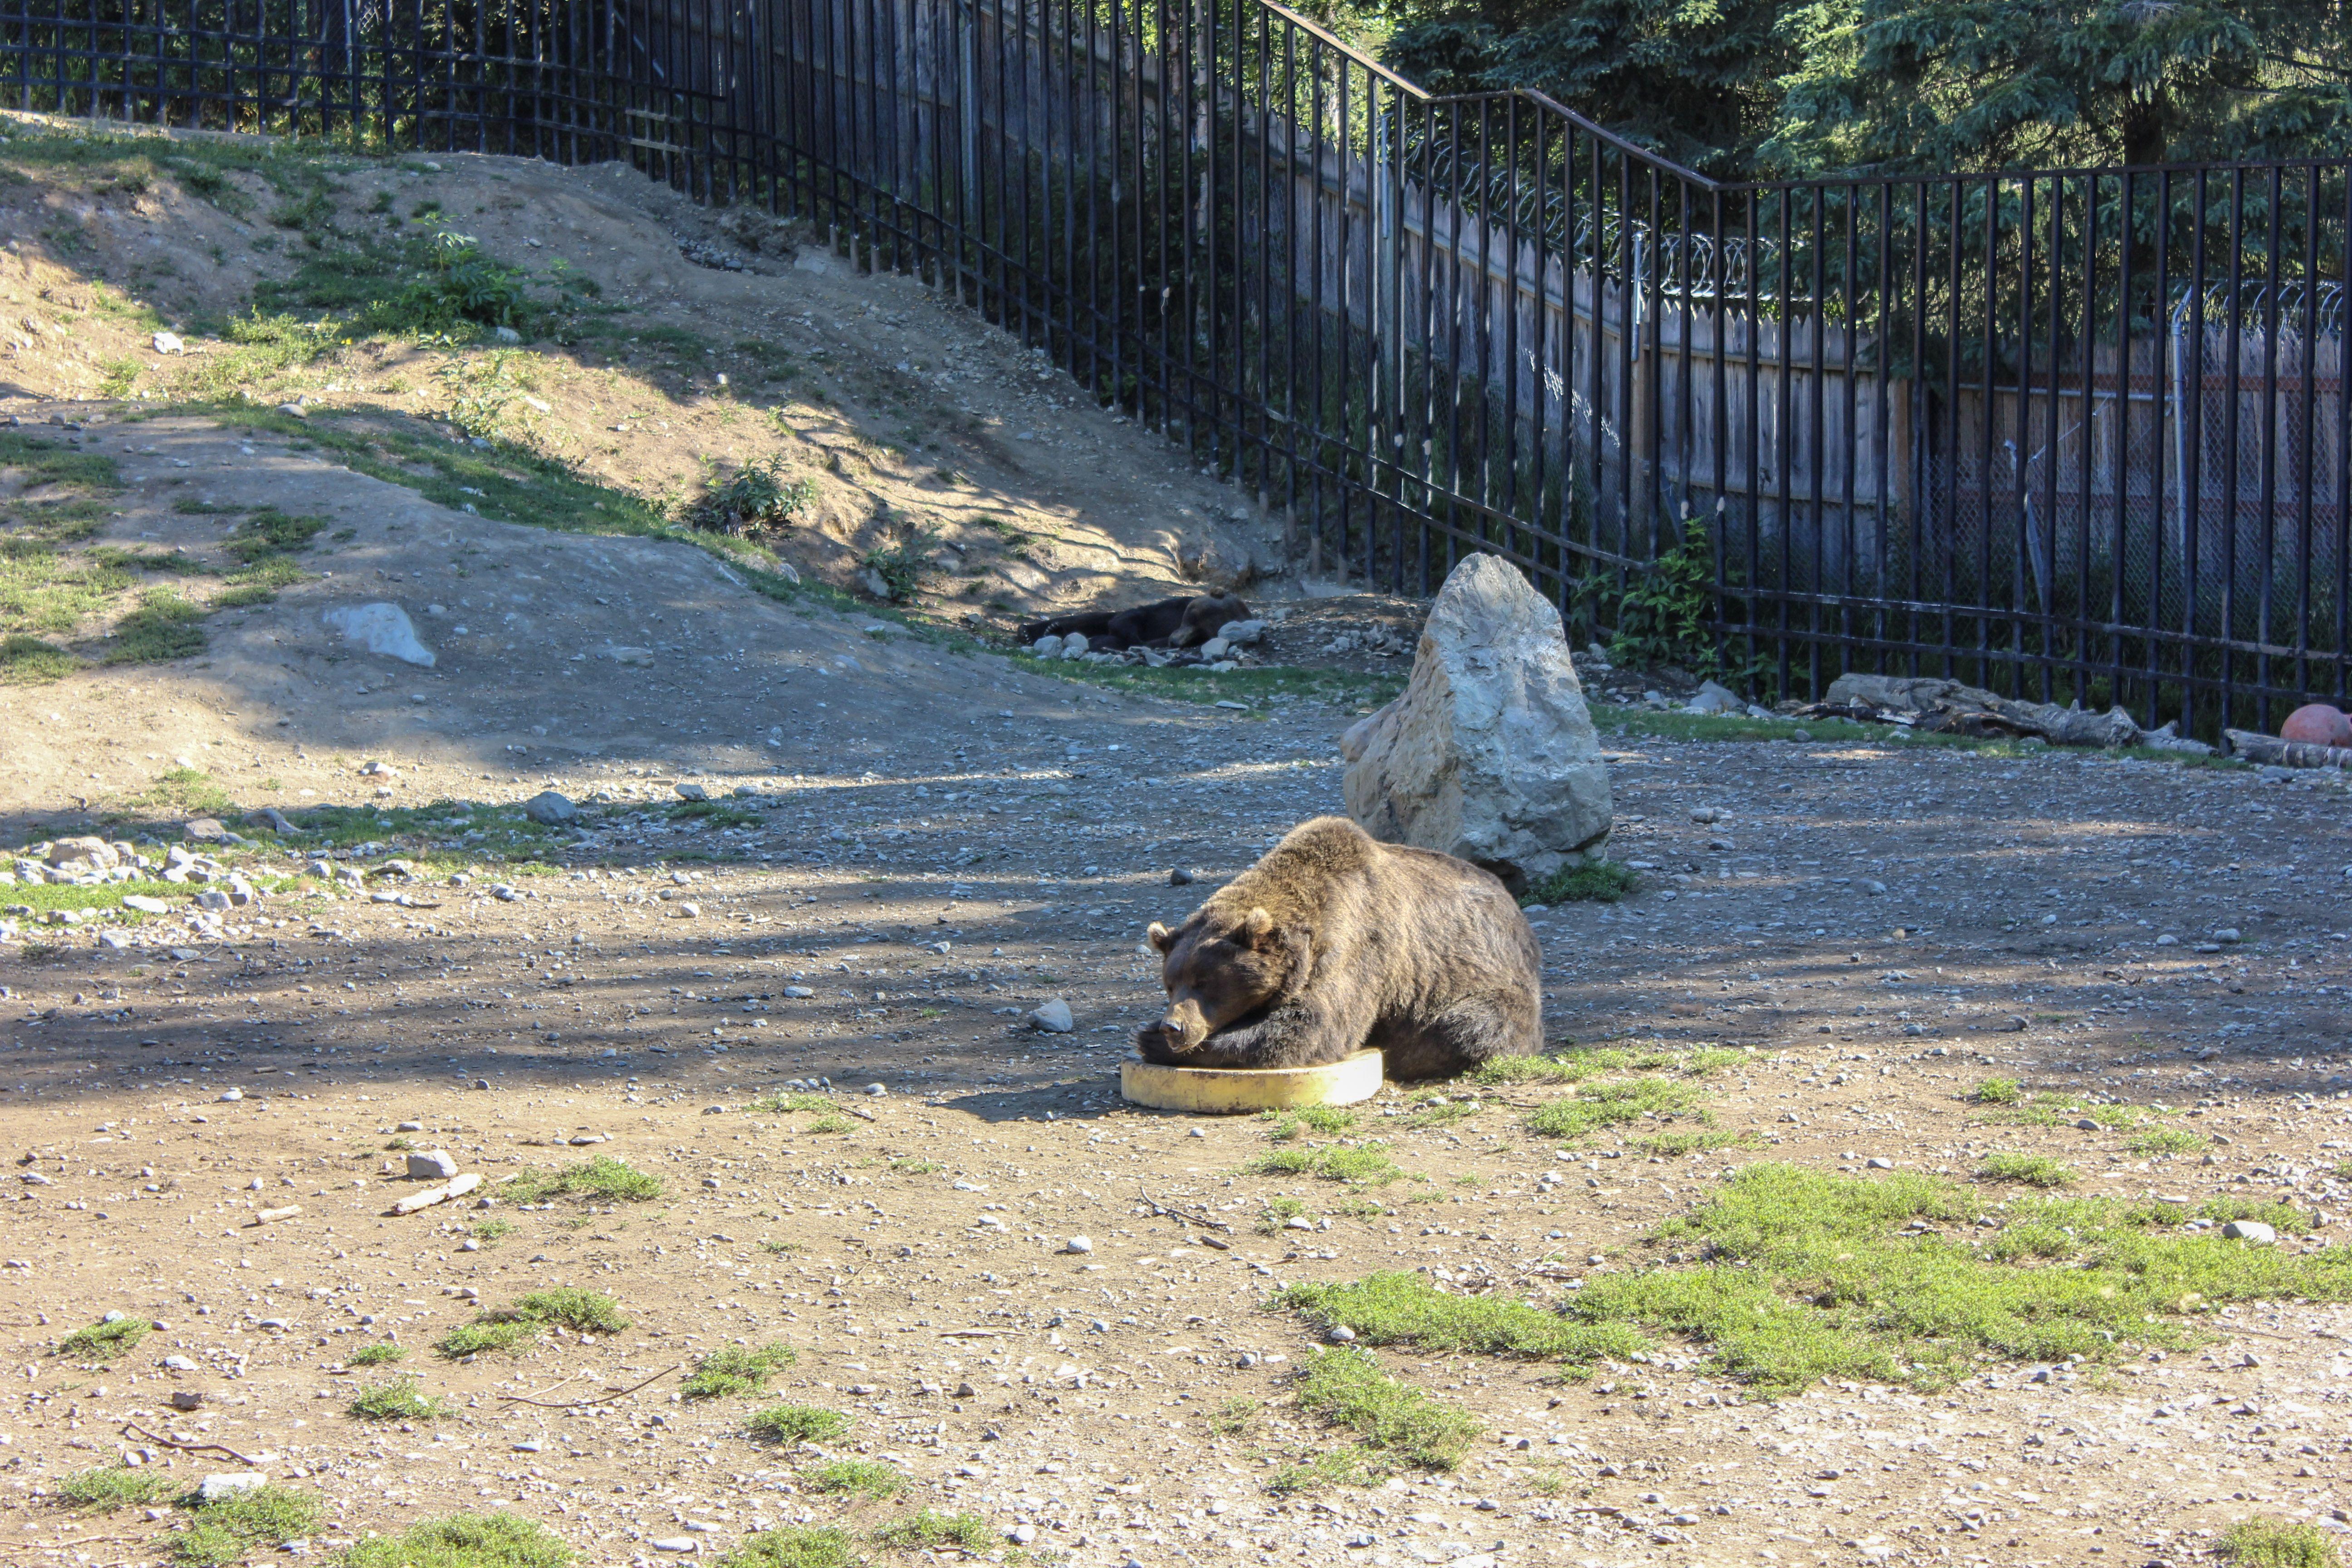 Alaska Zoo Alaska, Our adventure book, Kenai fjords